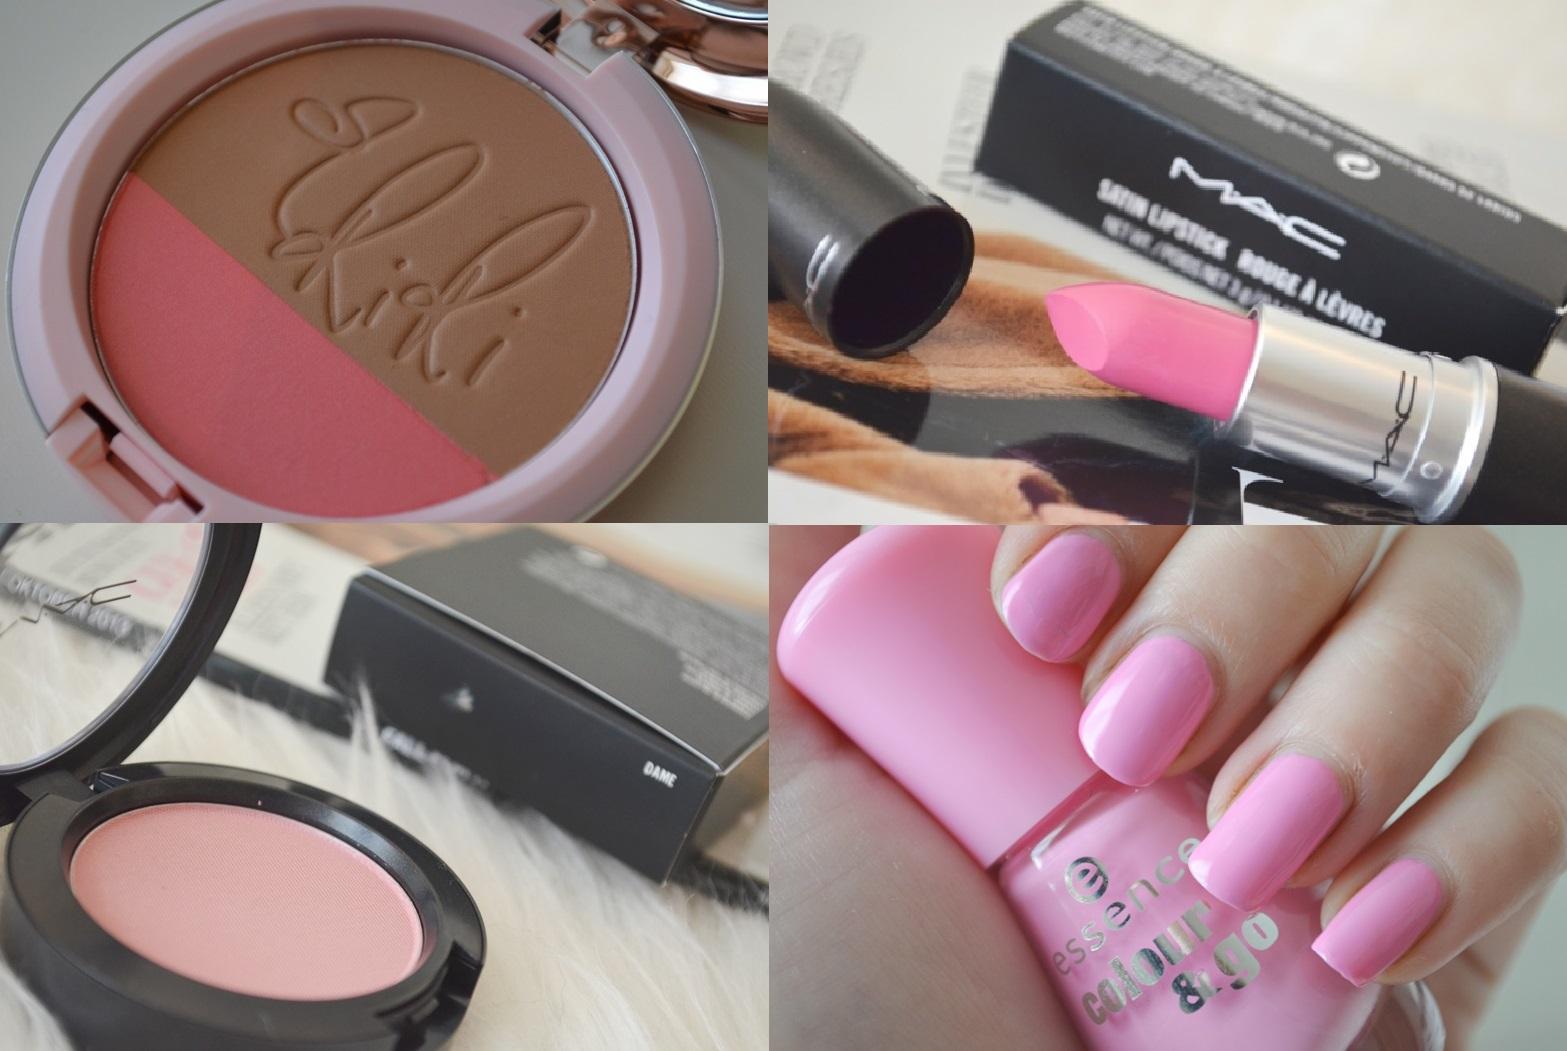 Samen4 - Mijn Favoriete Zomerse Make-up